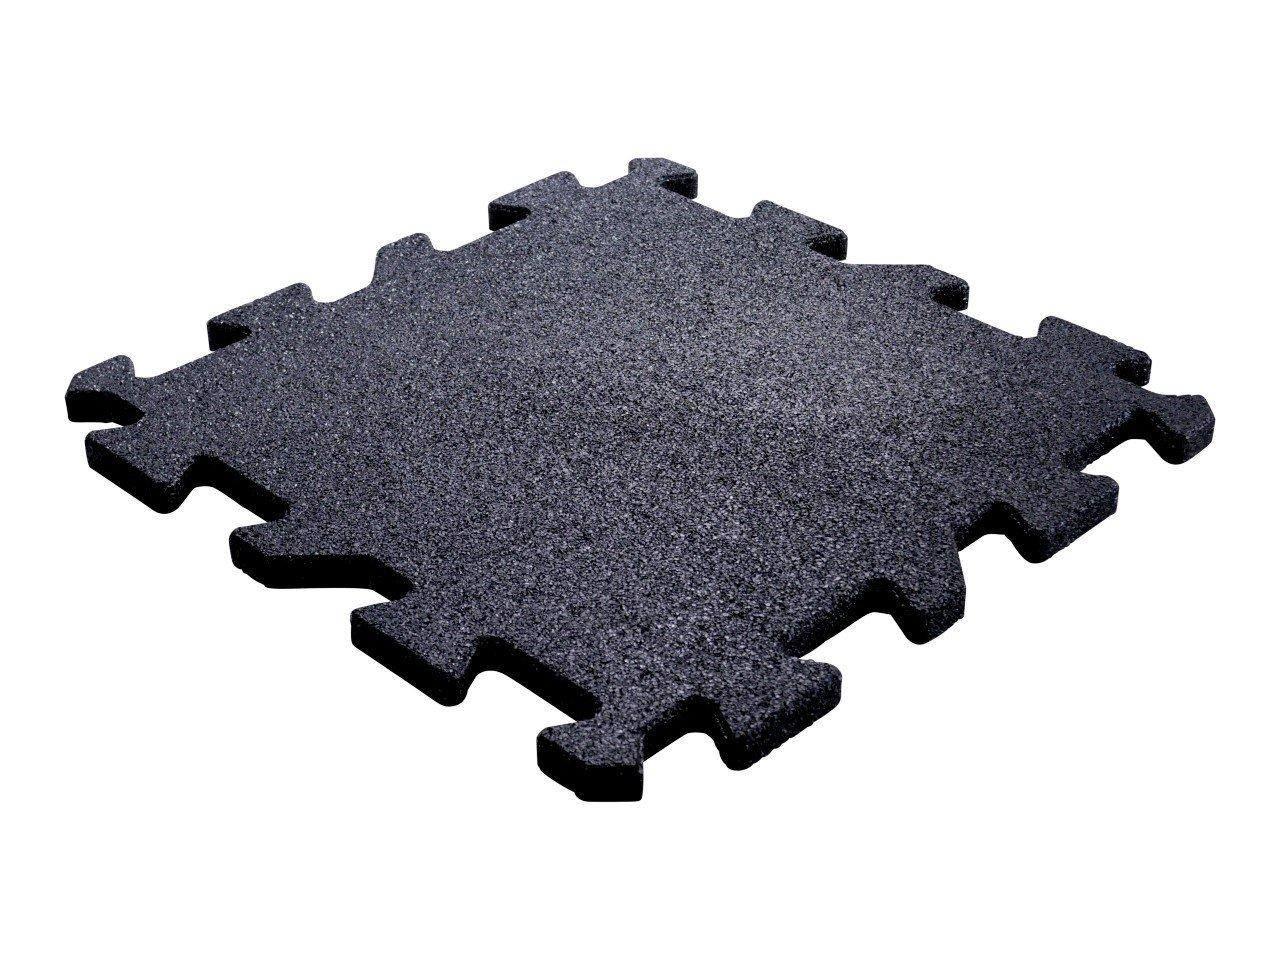 Crossmaxx Jigsaw Gummiflise 50 x 50 x 2 cm